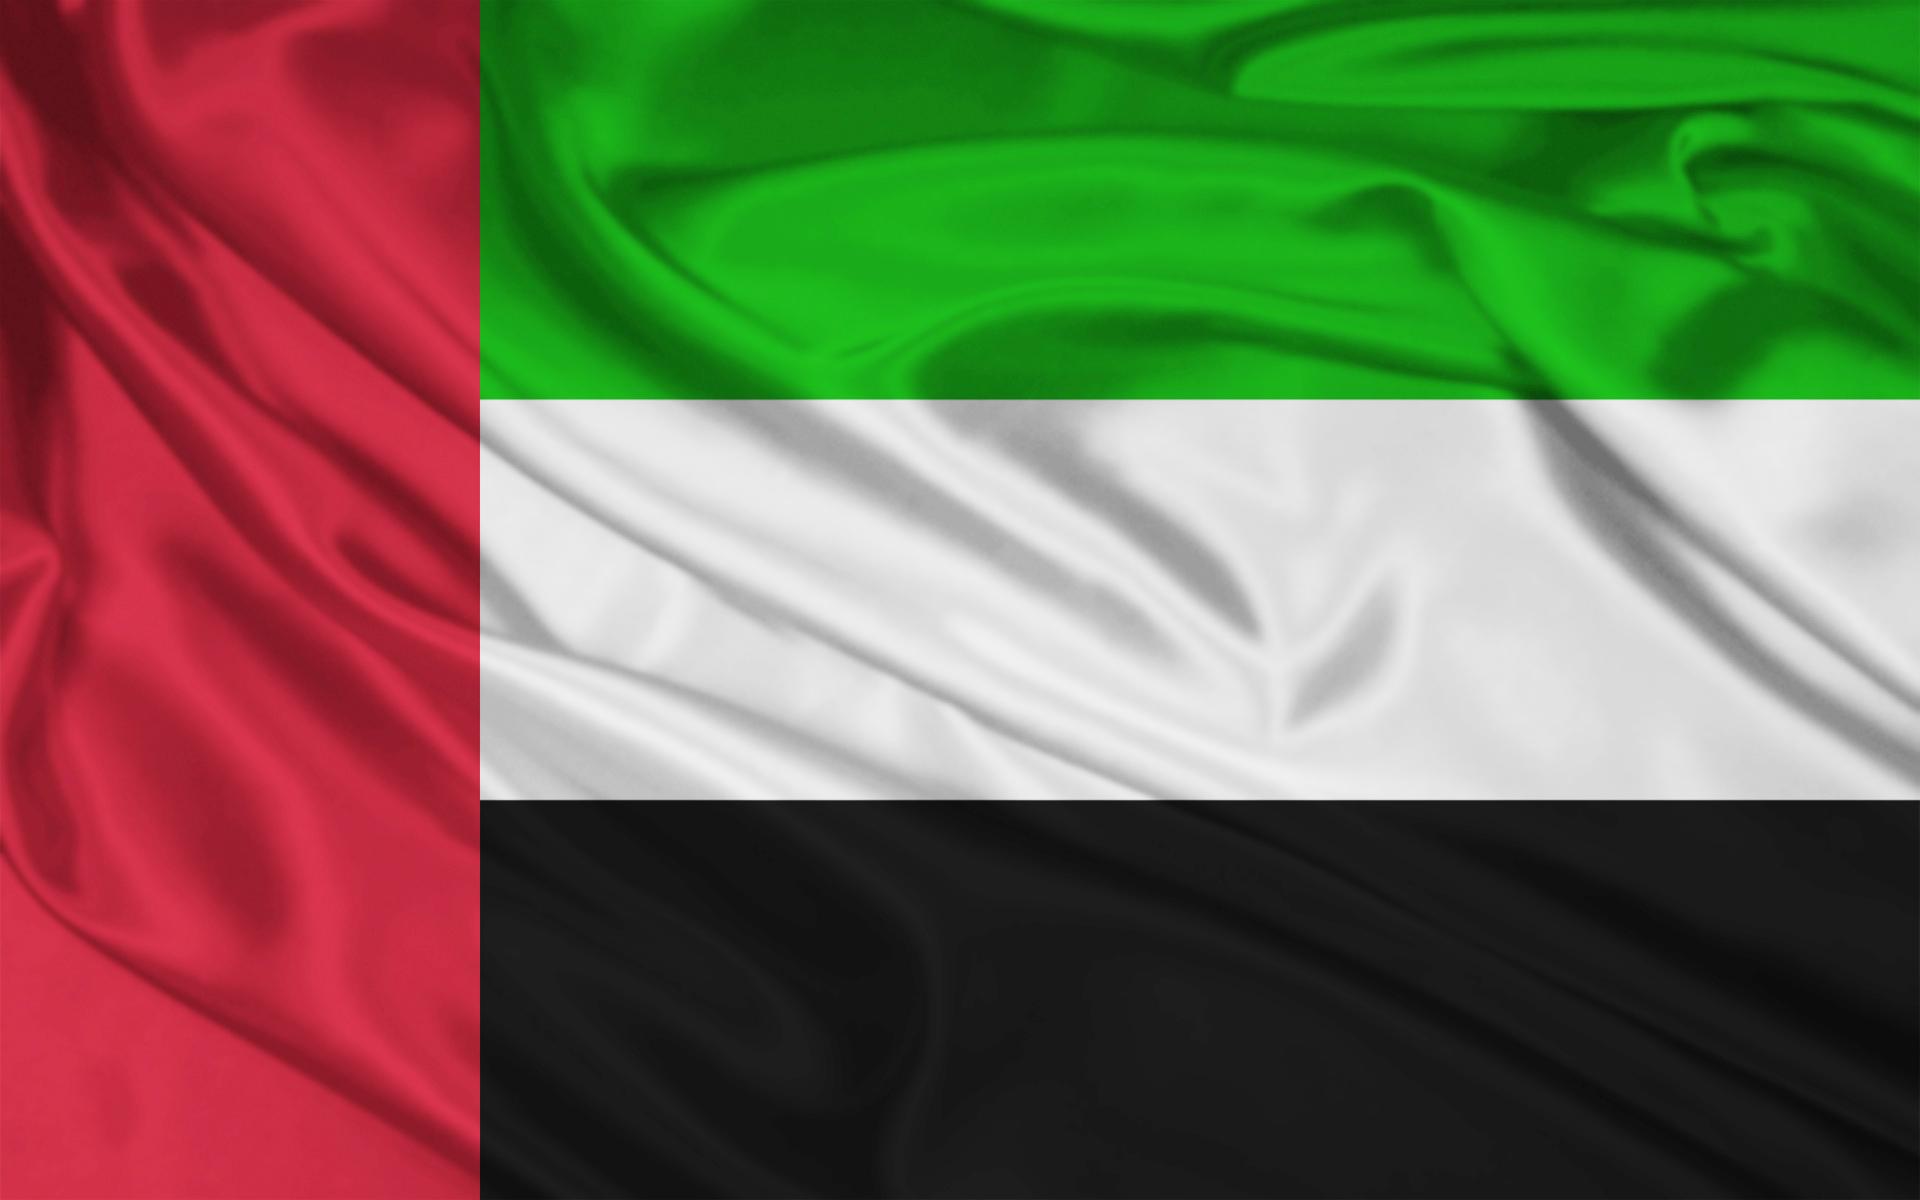 1920x1200 United Arab Emirates Flag desktop PC and Mac wallpaper 1920x1200